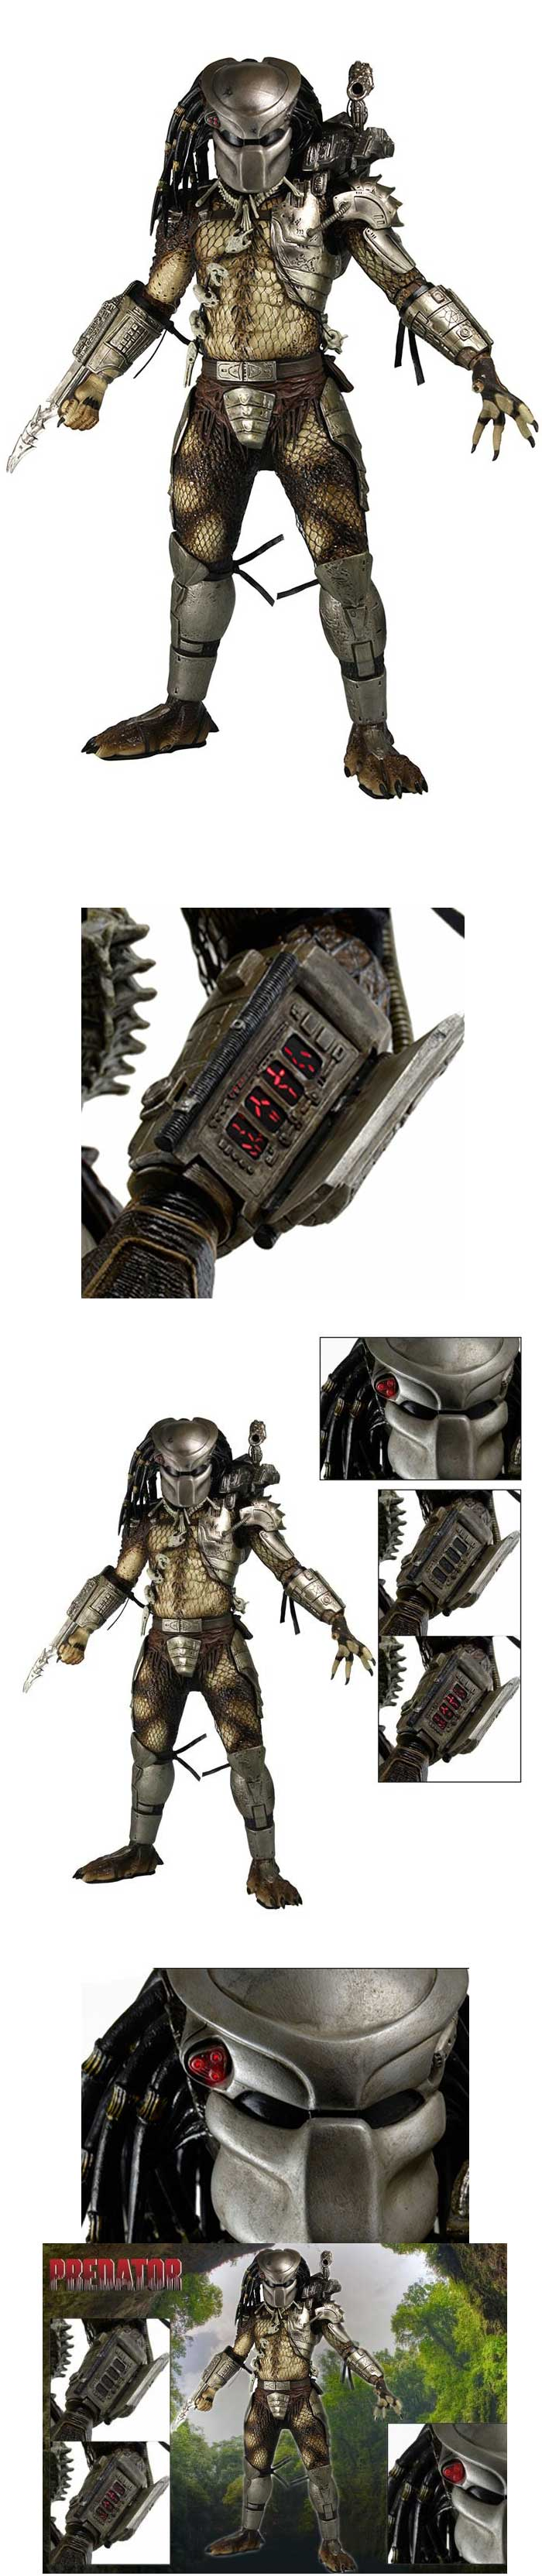 [Neca - Predator: 1/4th scale Jungle Hunter Predator with LED Lights]